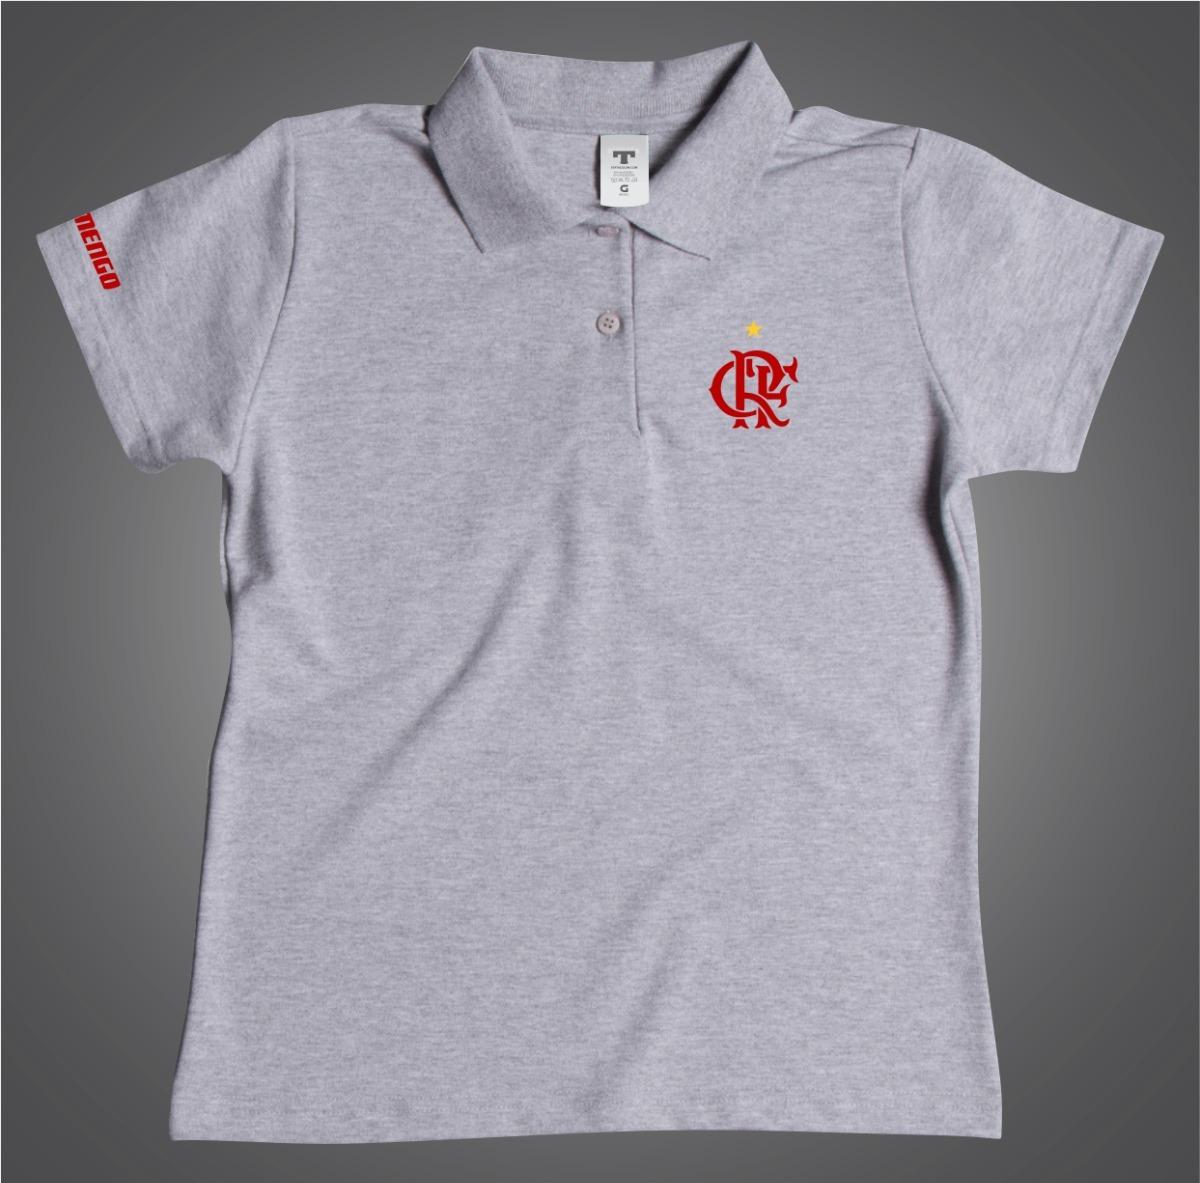 0451fec052 Camisa Flamengo Polo Feminina Branca Baby Look - R  54